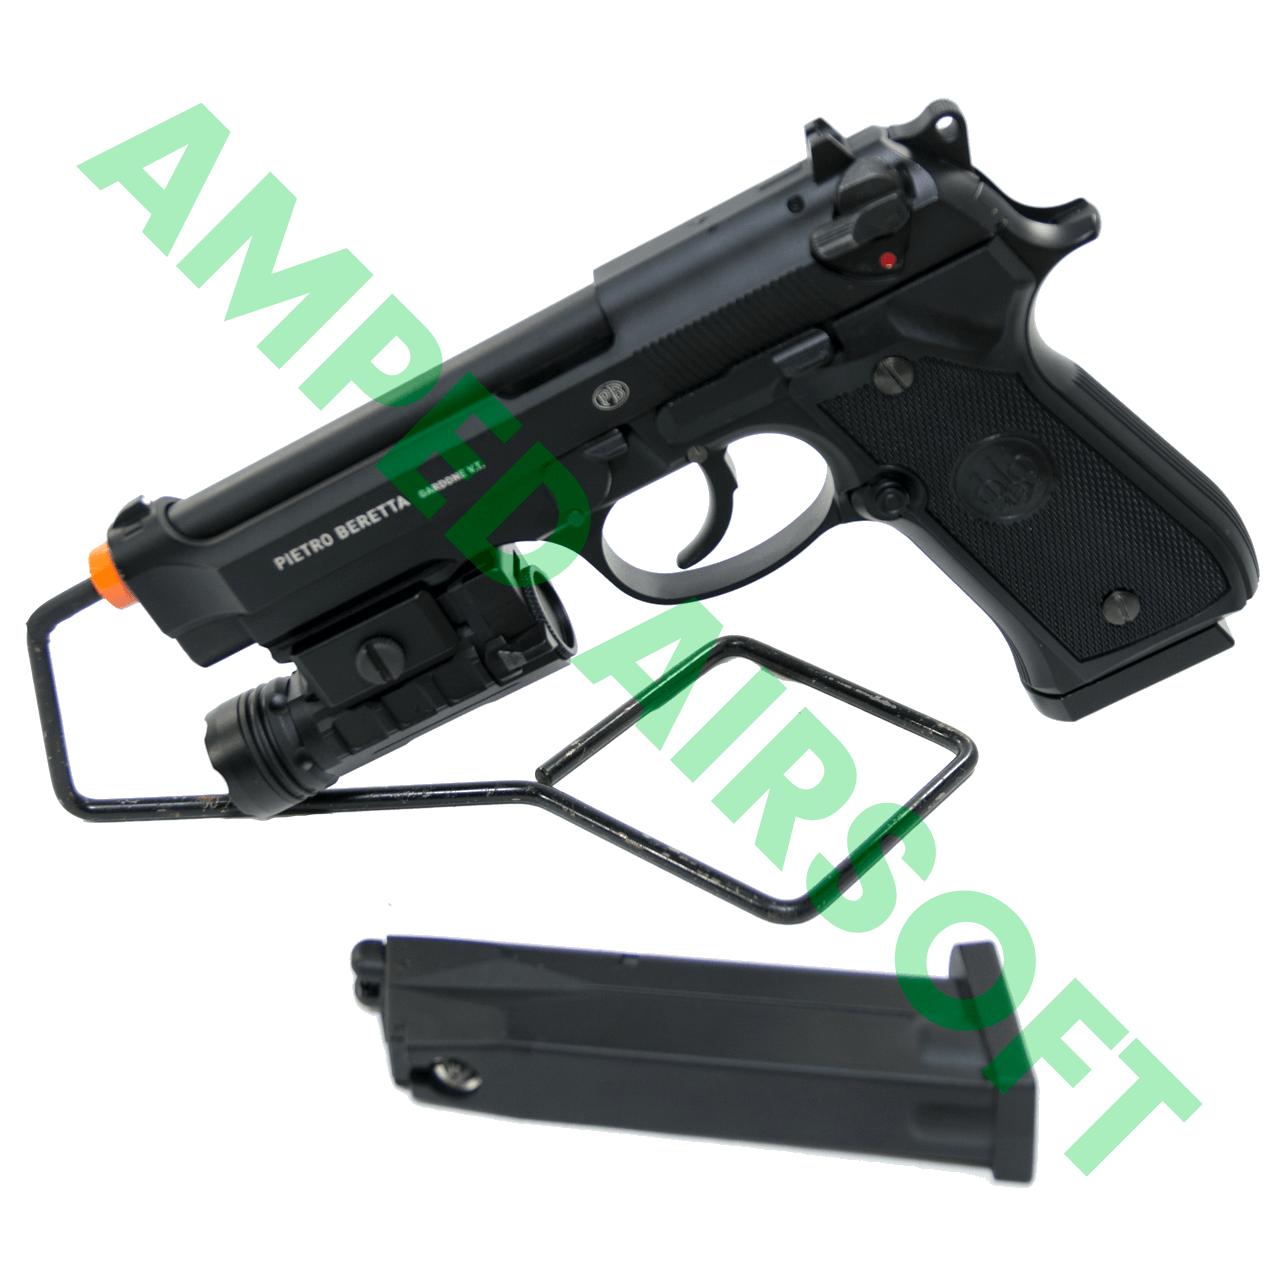 Amped Bundle - Elite Force Beretta M92 A1 CO2 Blowback Pistol Light & Magazine Bundle with Light Mounted